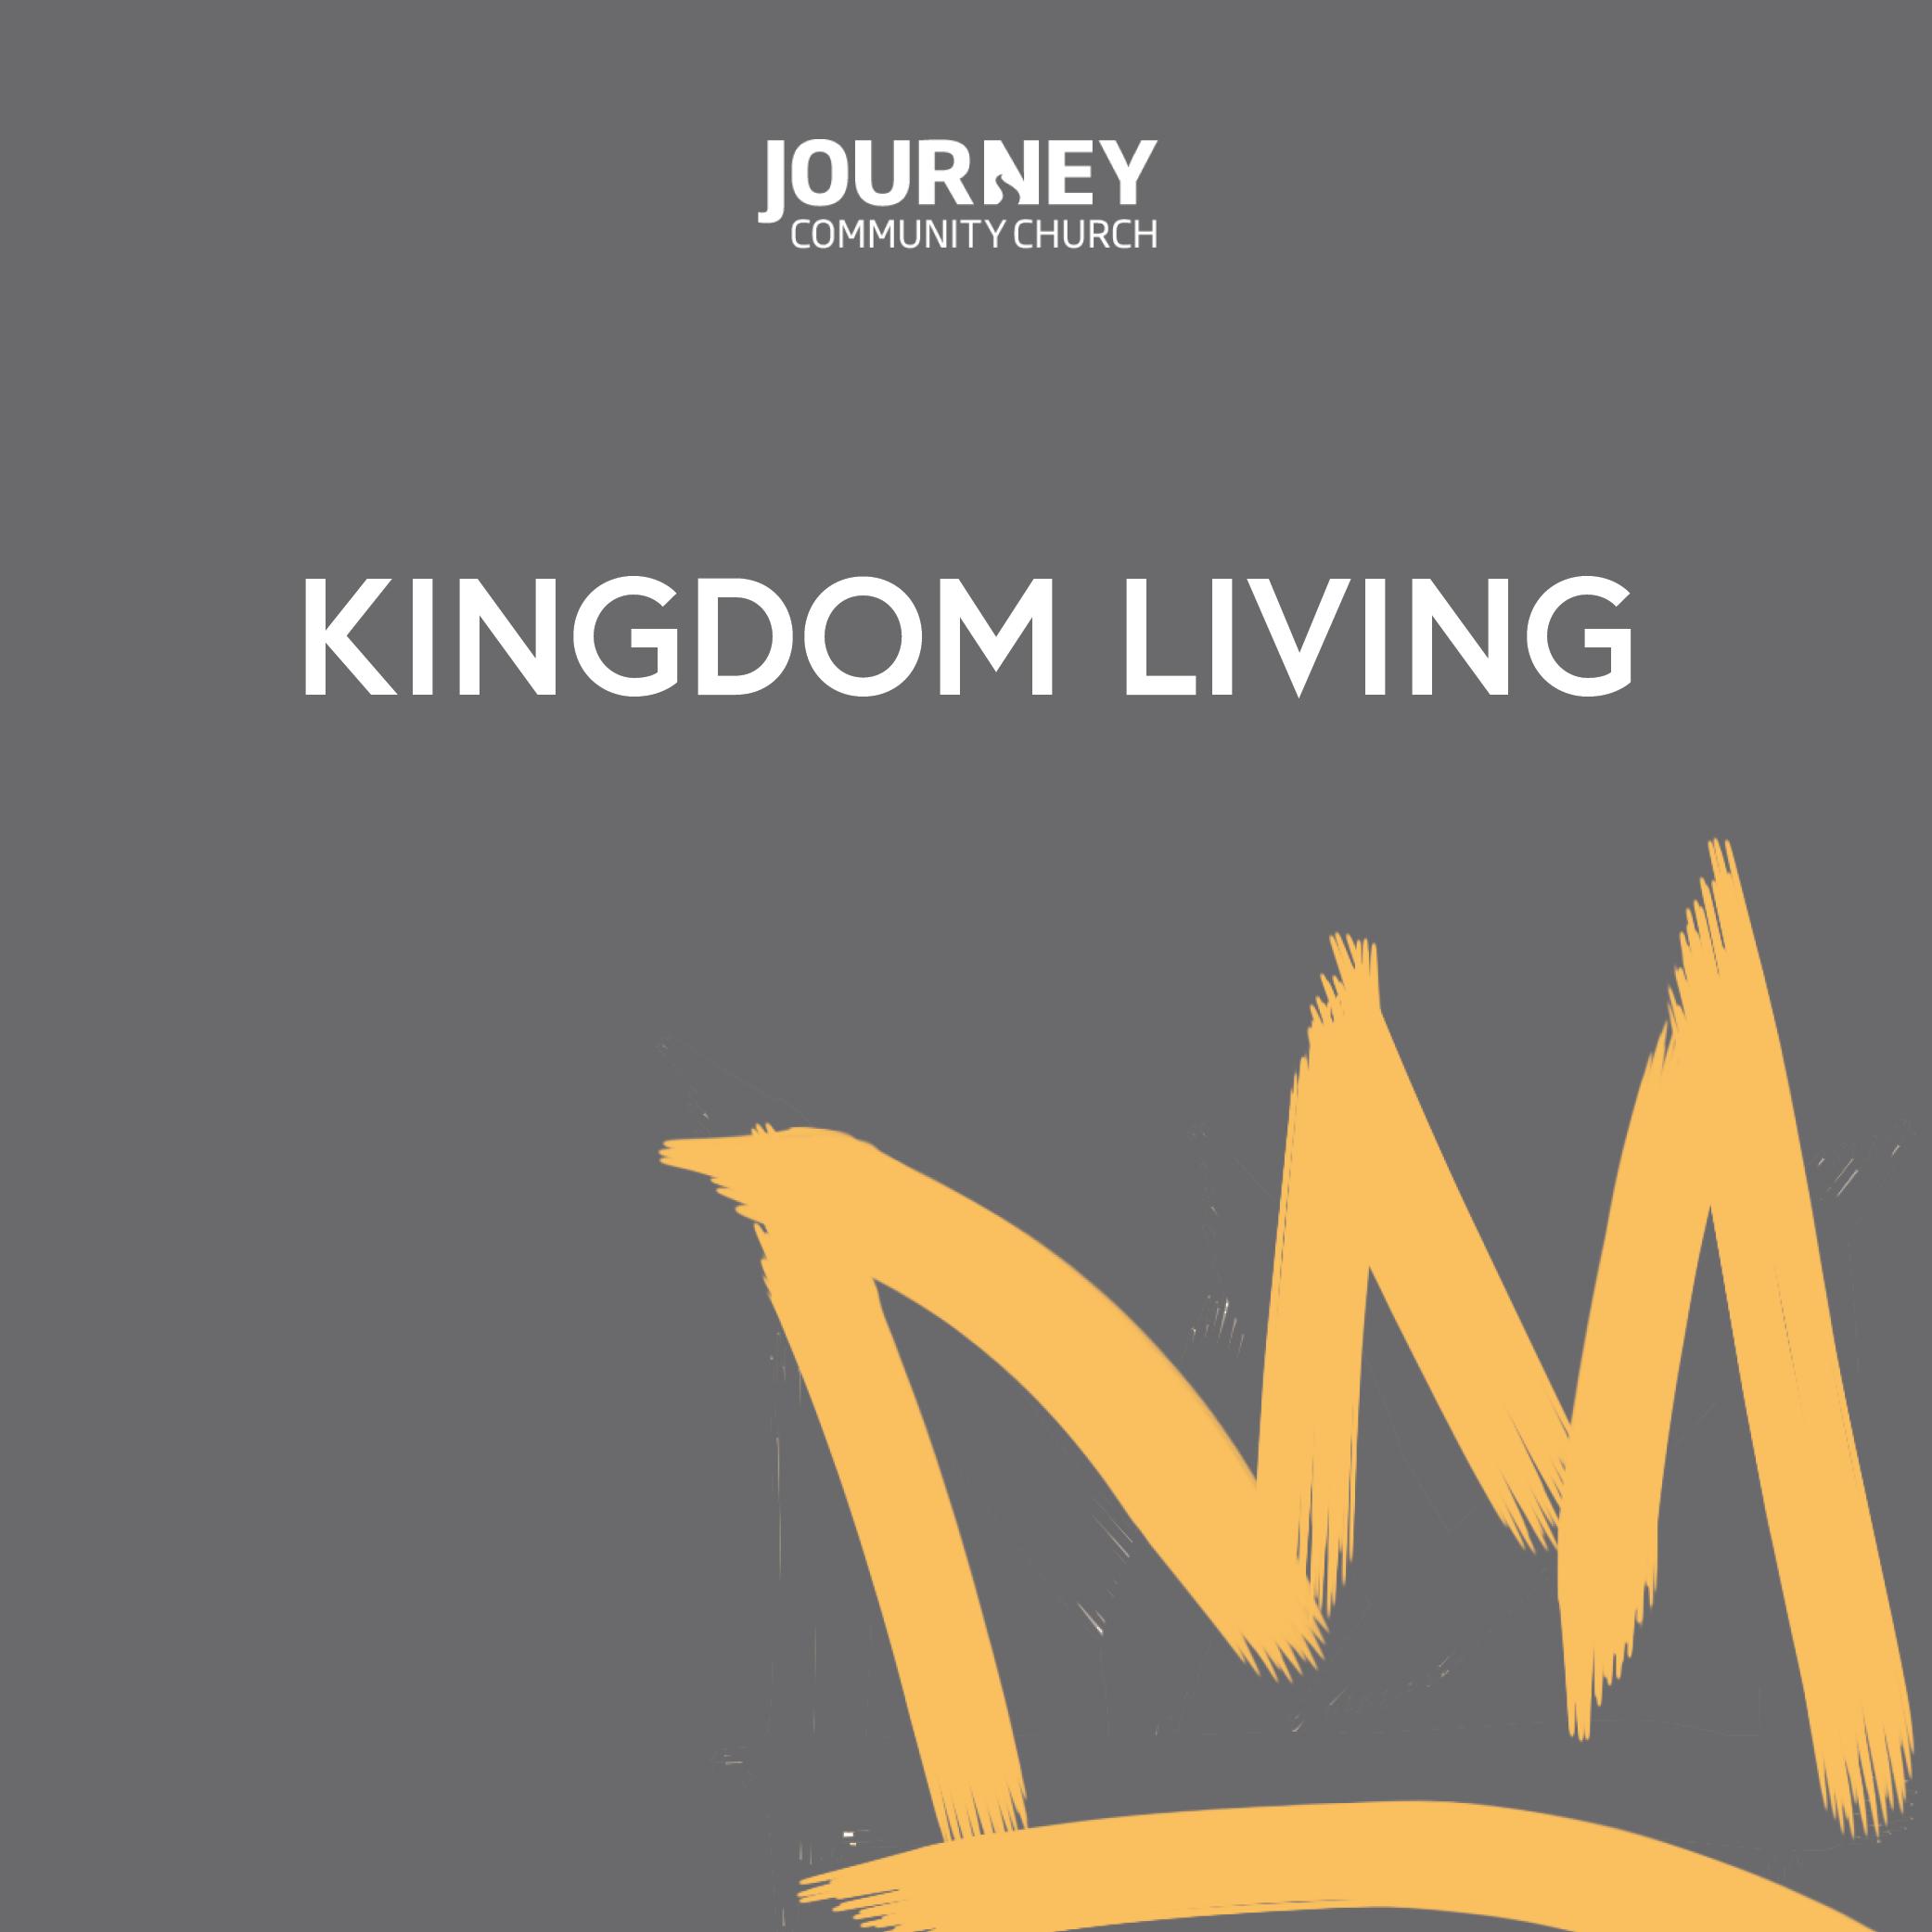 kingdomliving.png